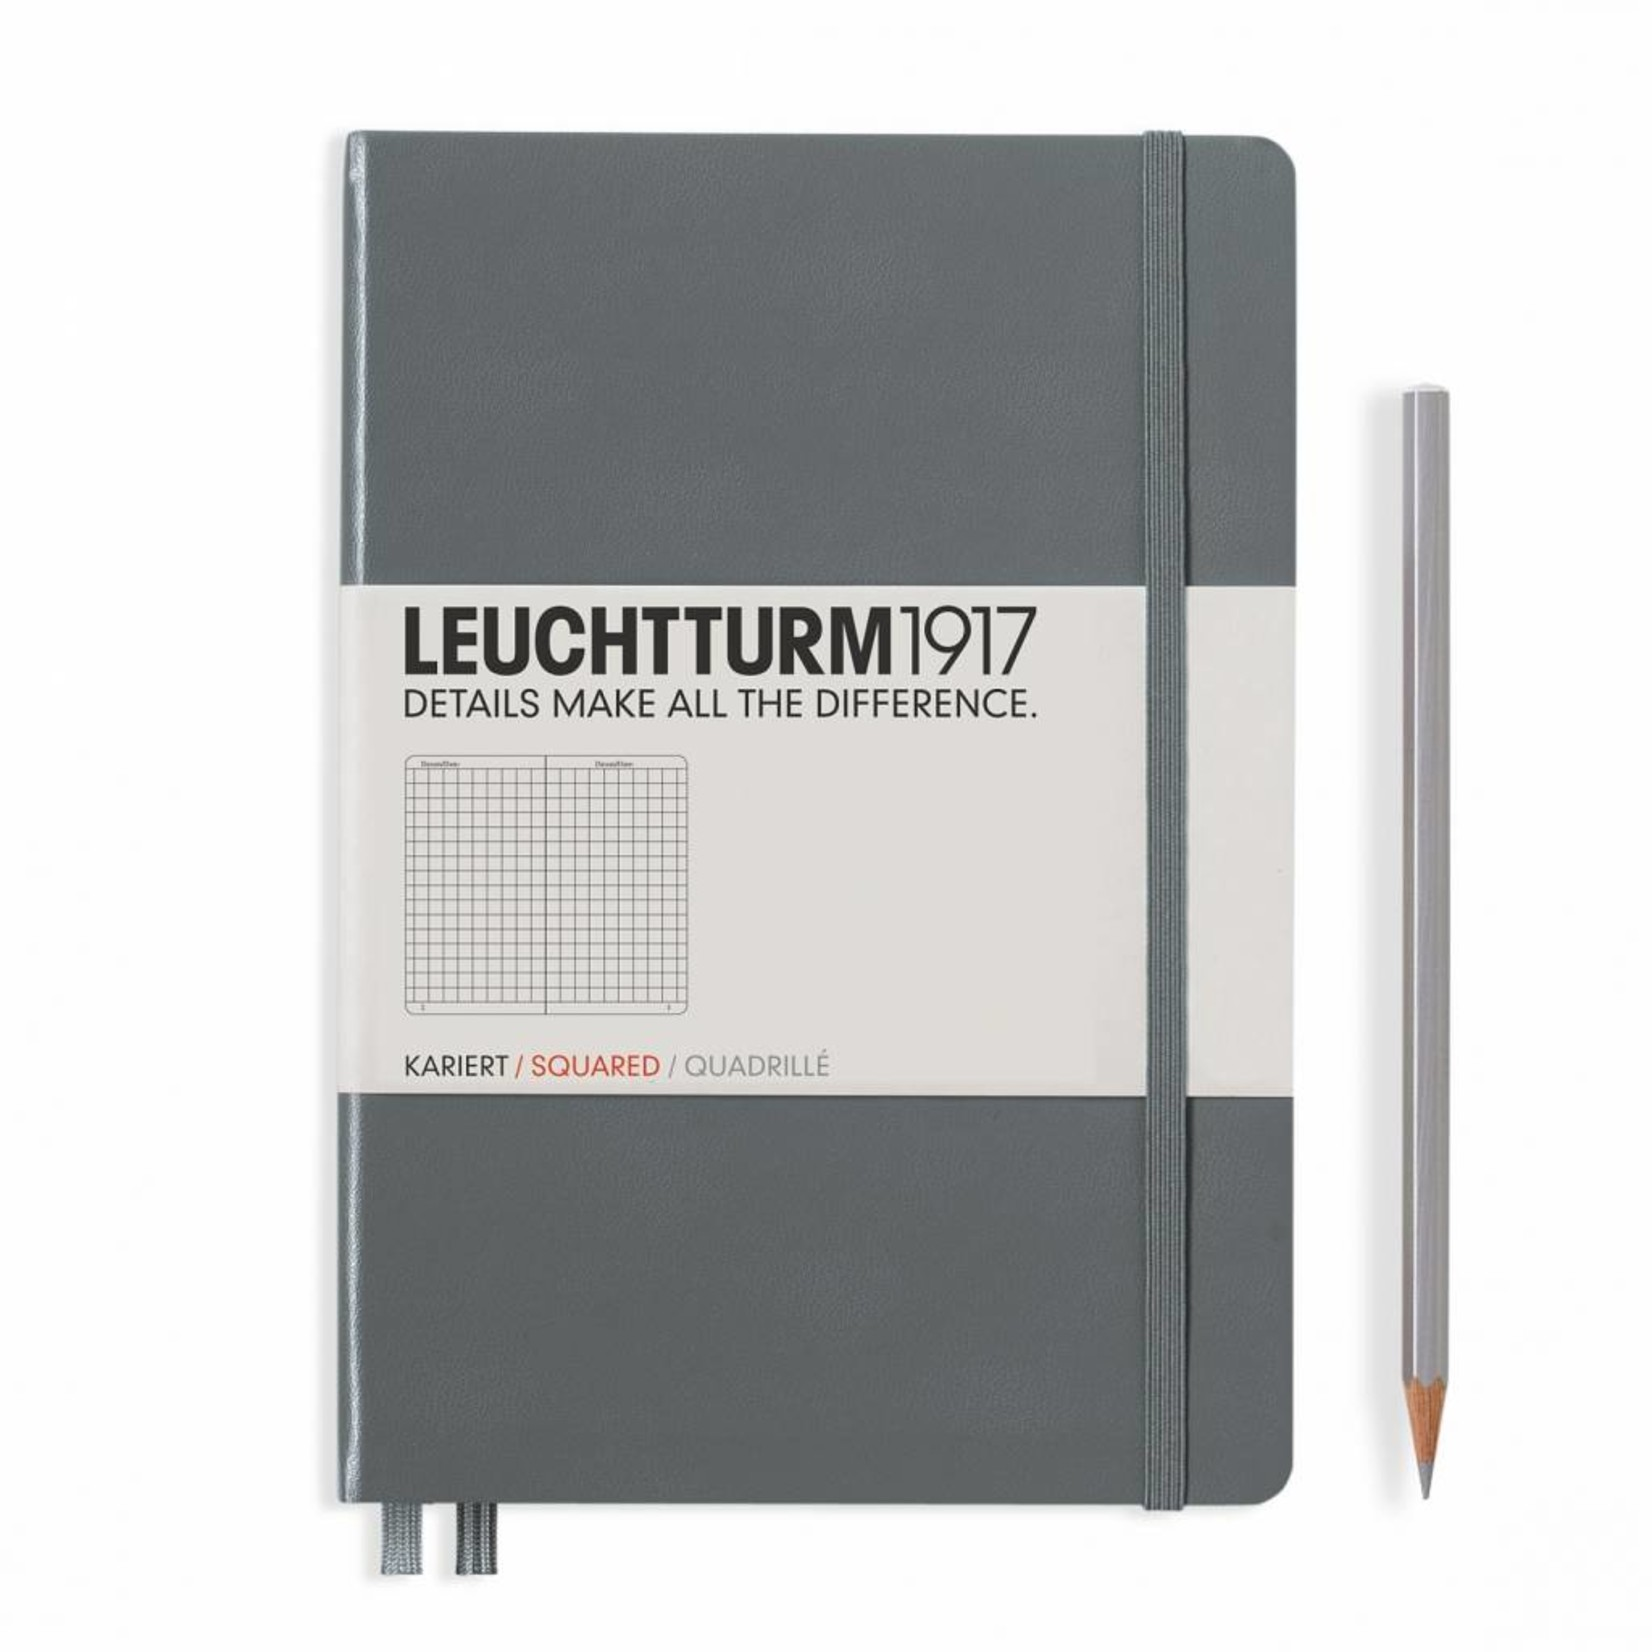 Leuchtturm1917 Leuchtturm1917 Notizbuch, Medium, Anthrazit, Kariert